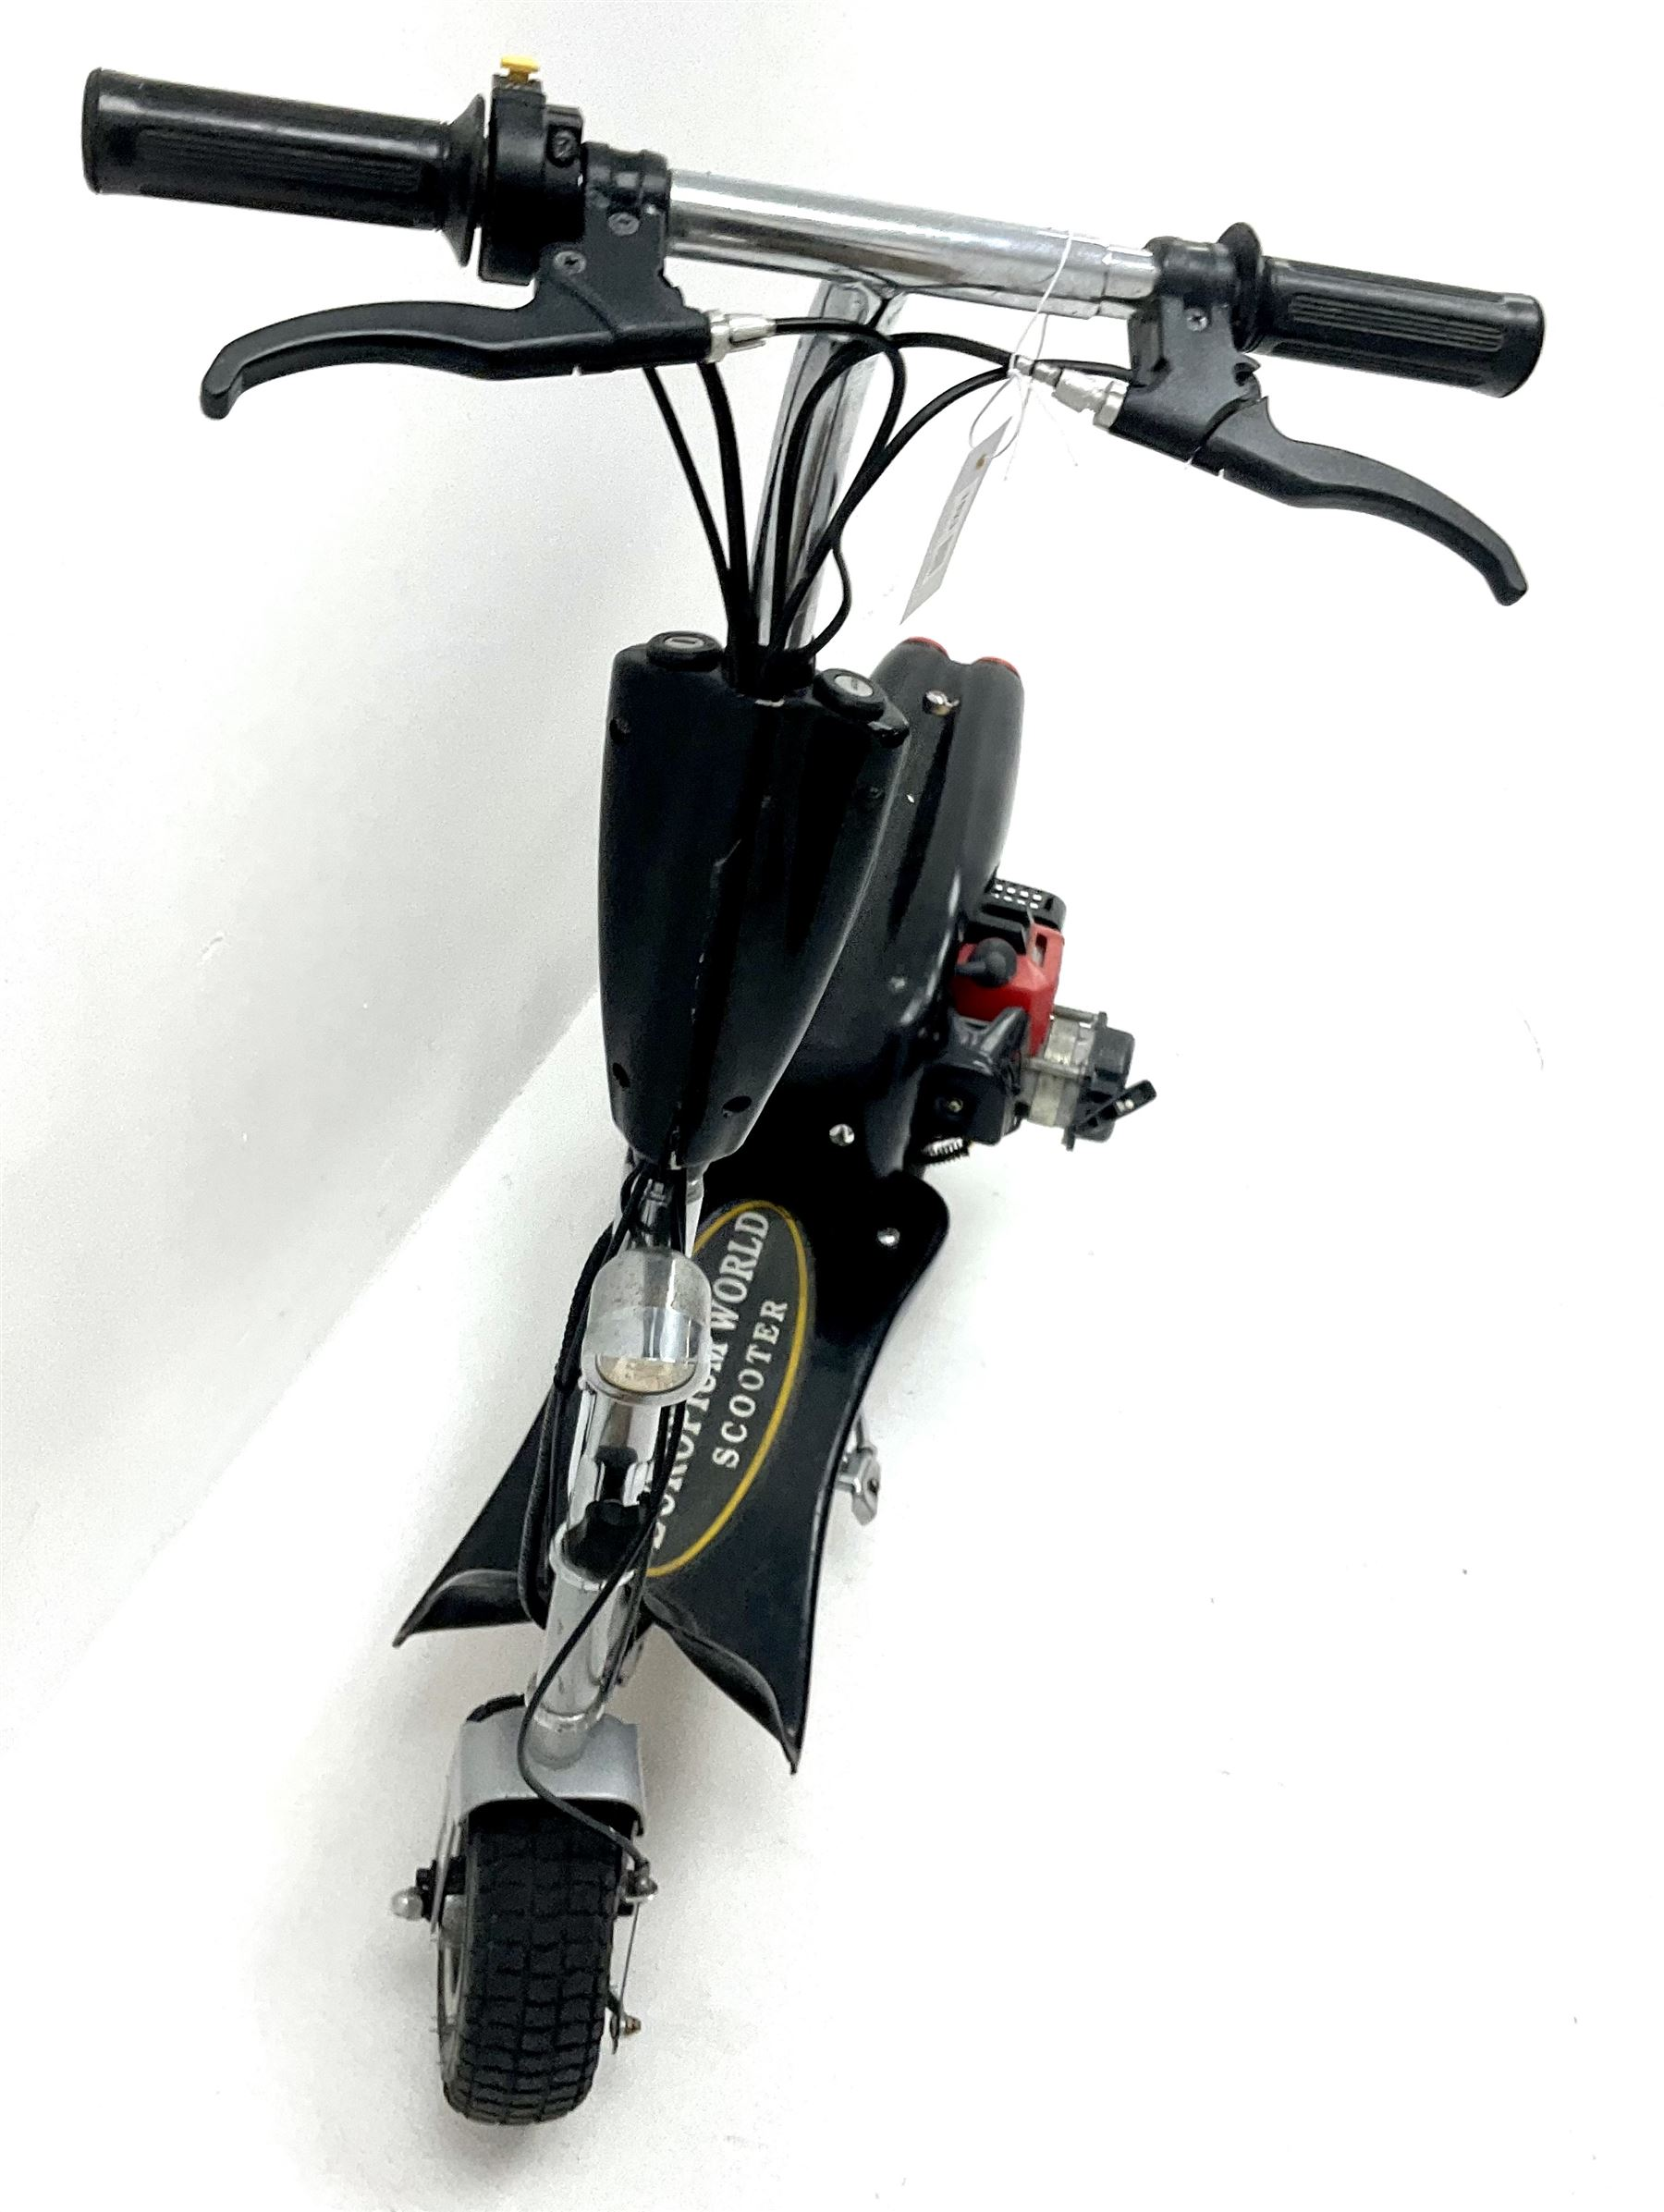 Emporium World Scooter - Image 2 of 2